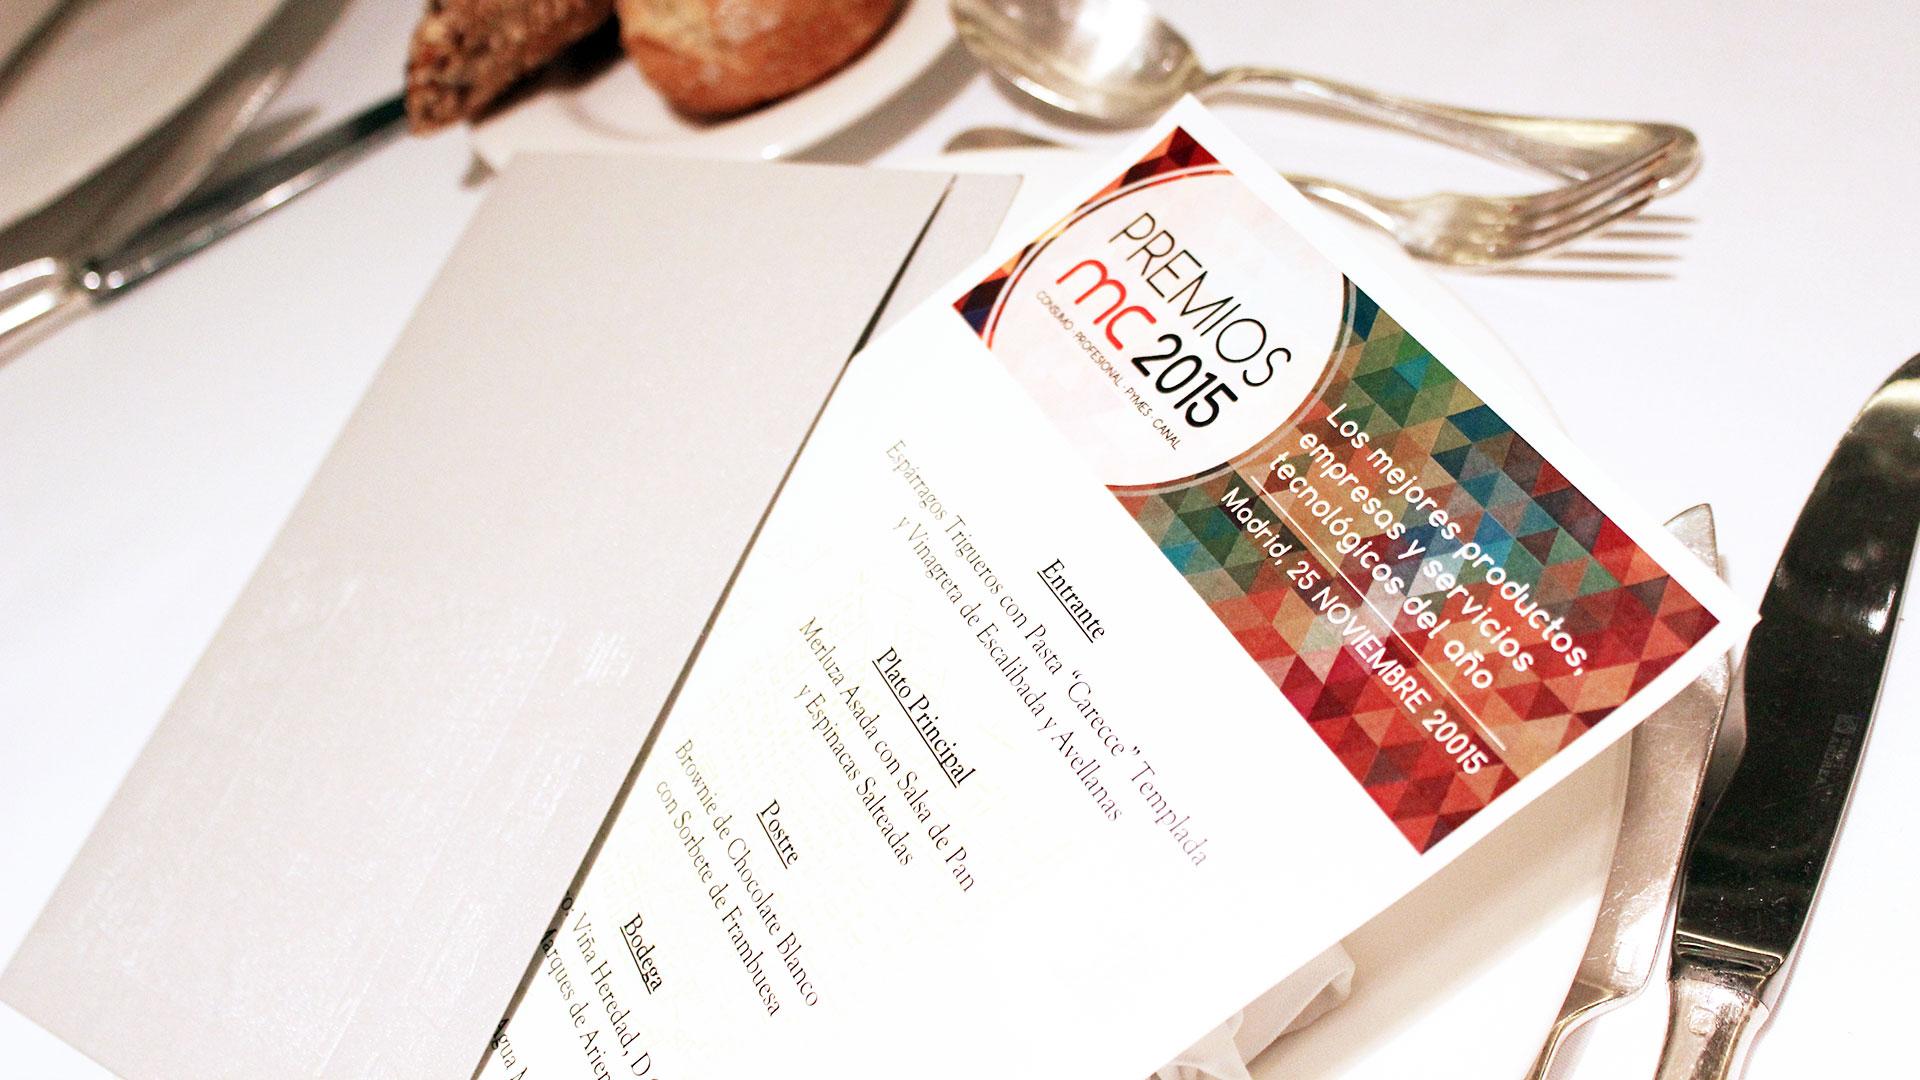 premios-mc2015-evento-comida-hotel-hesperia-mesa-menu-detalle